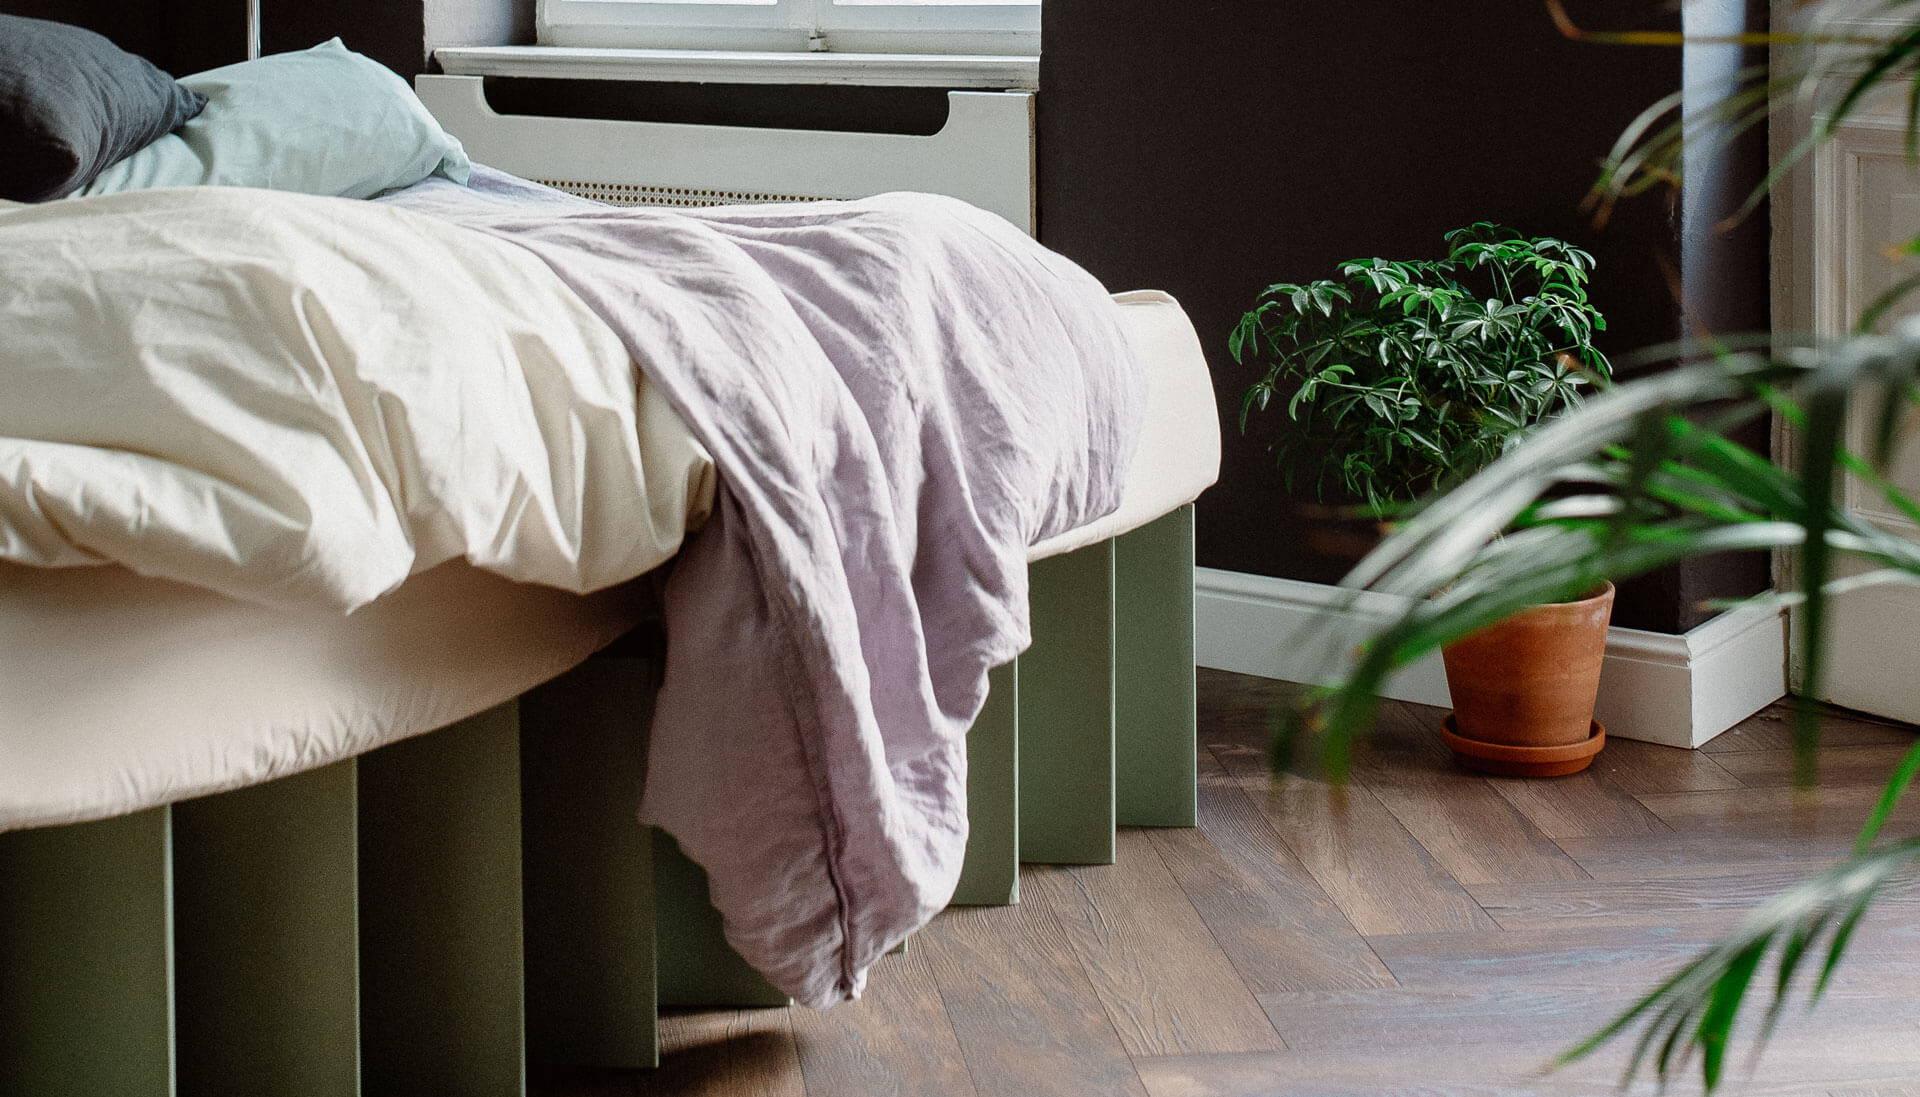 ROOM IN A BOX Co-Sleeping im grauen Familienbett aus Wellpappe